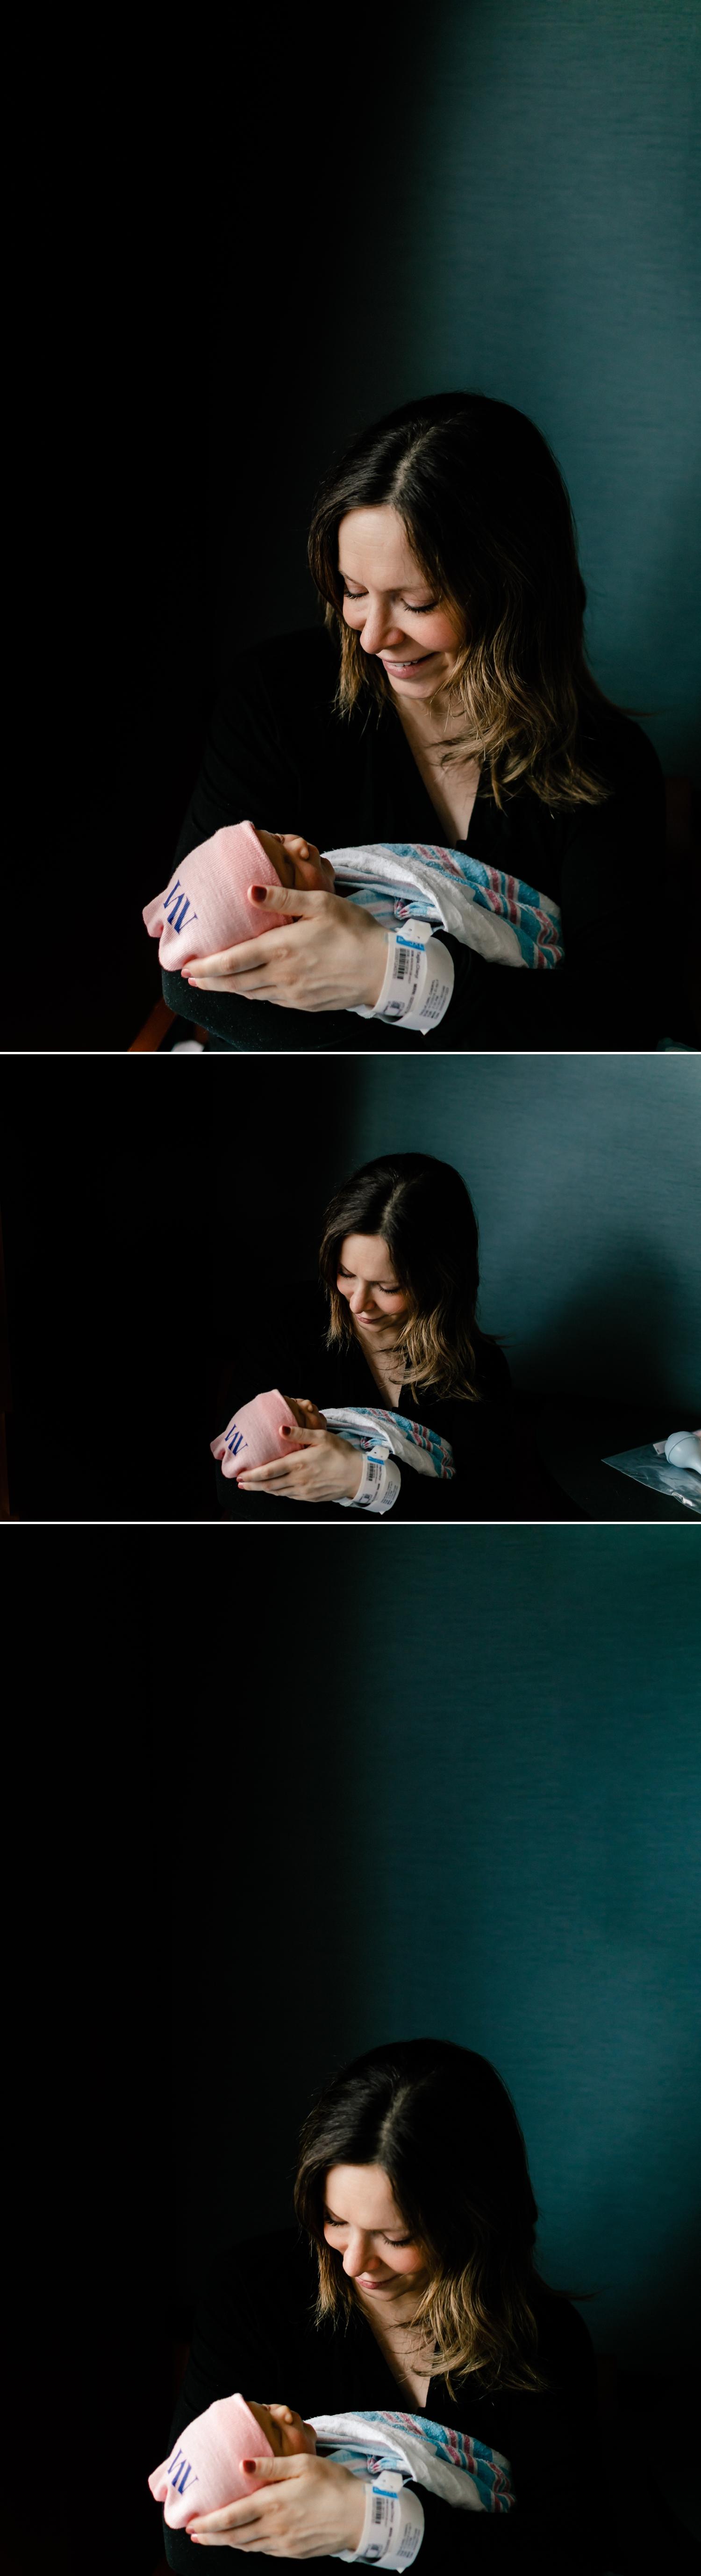 chicago-newborn-fresh48-hospital-lifestyle-photographer-jenny-grimm-photography_0006.jpg